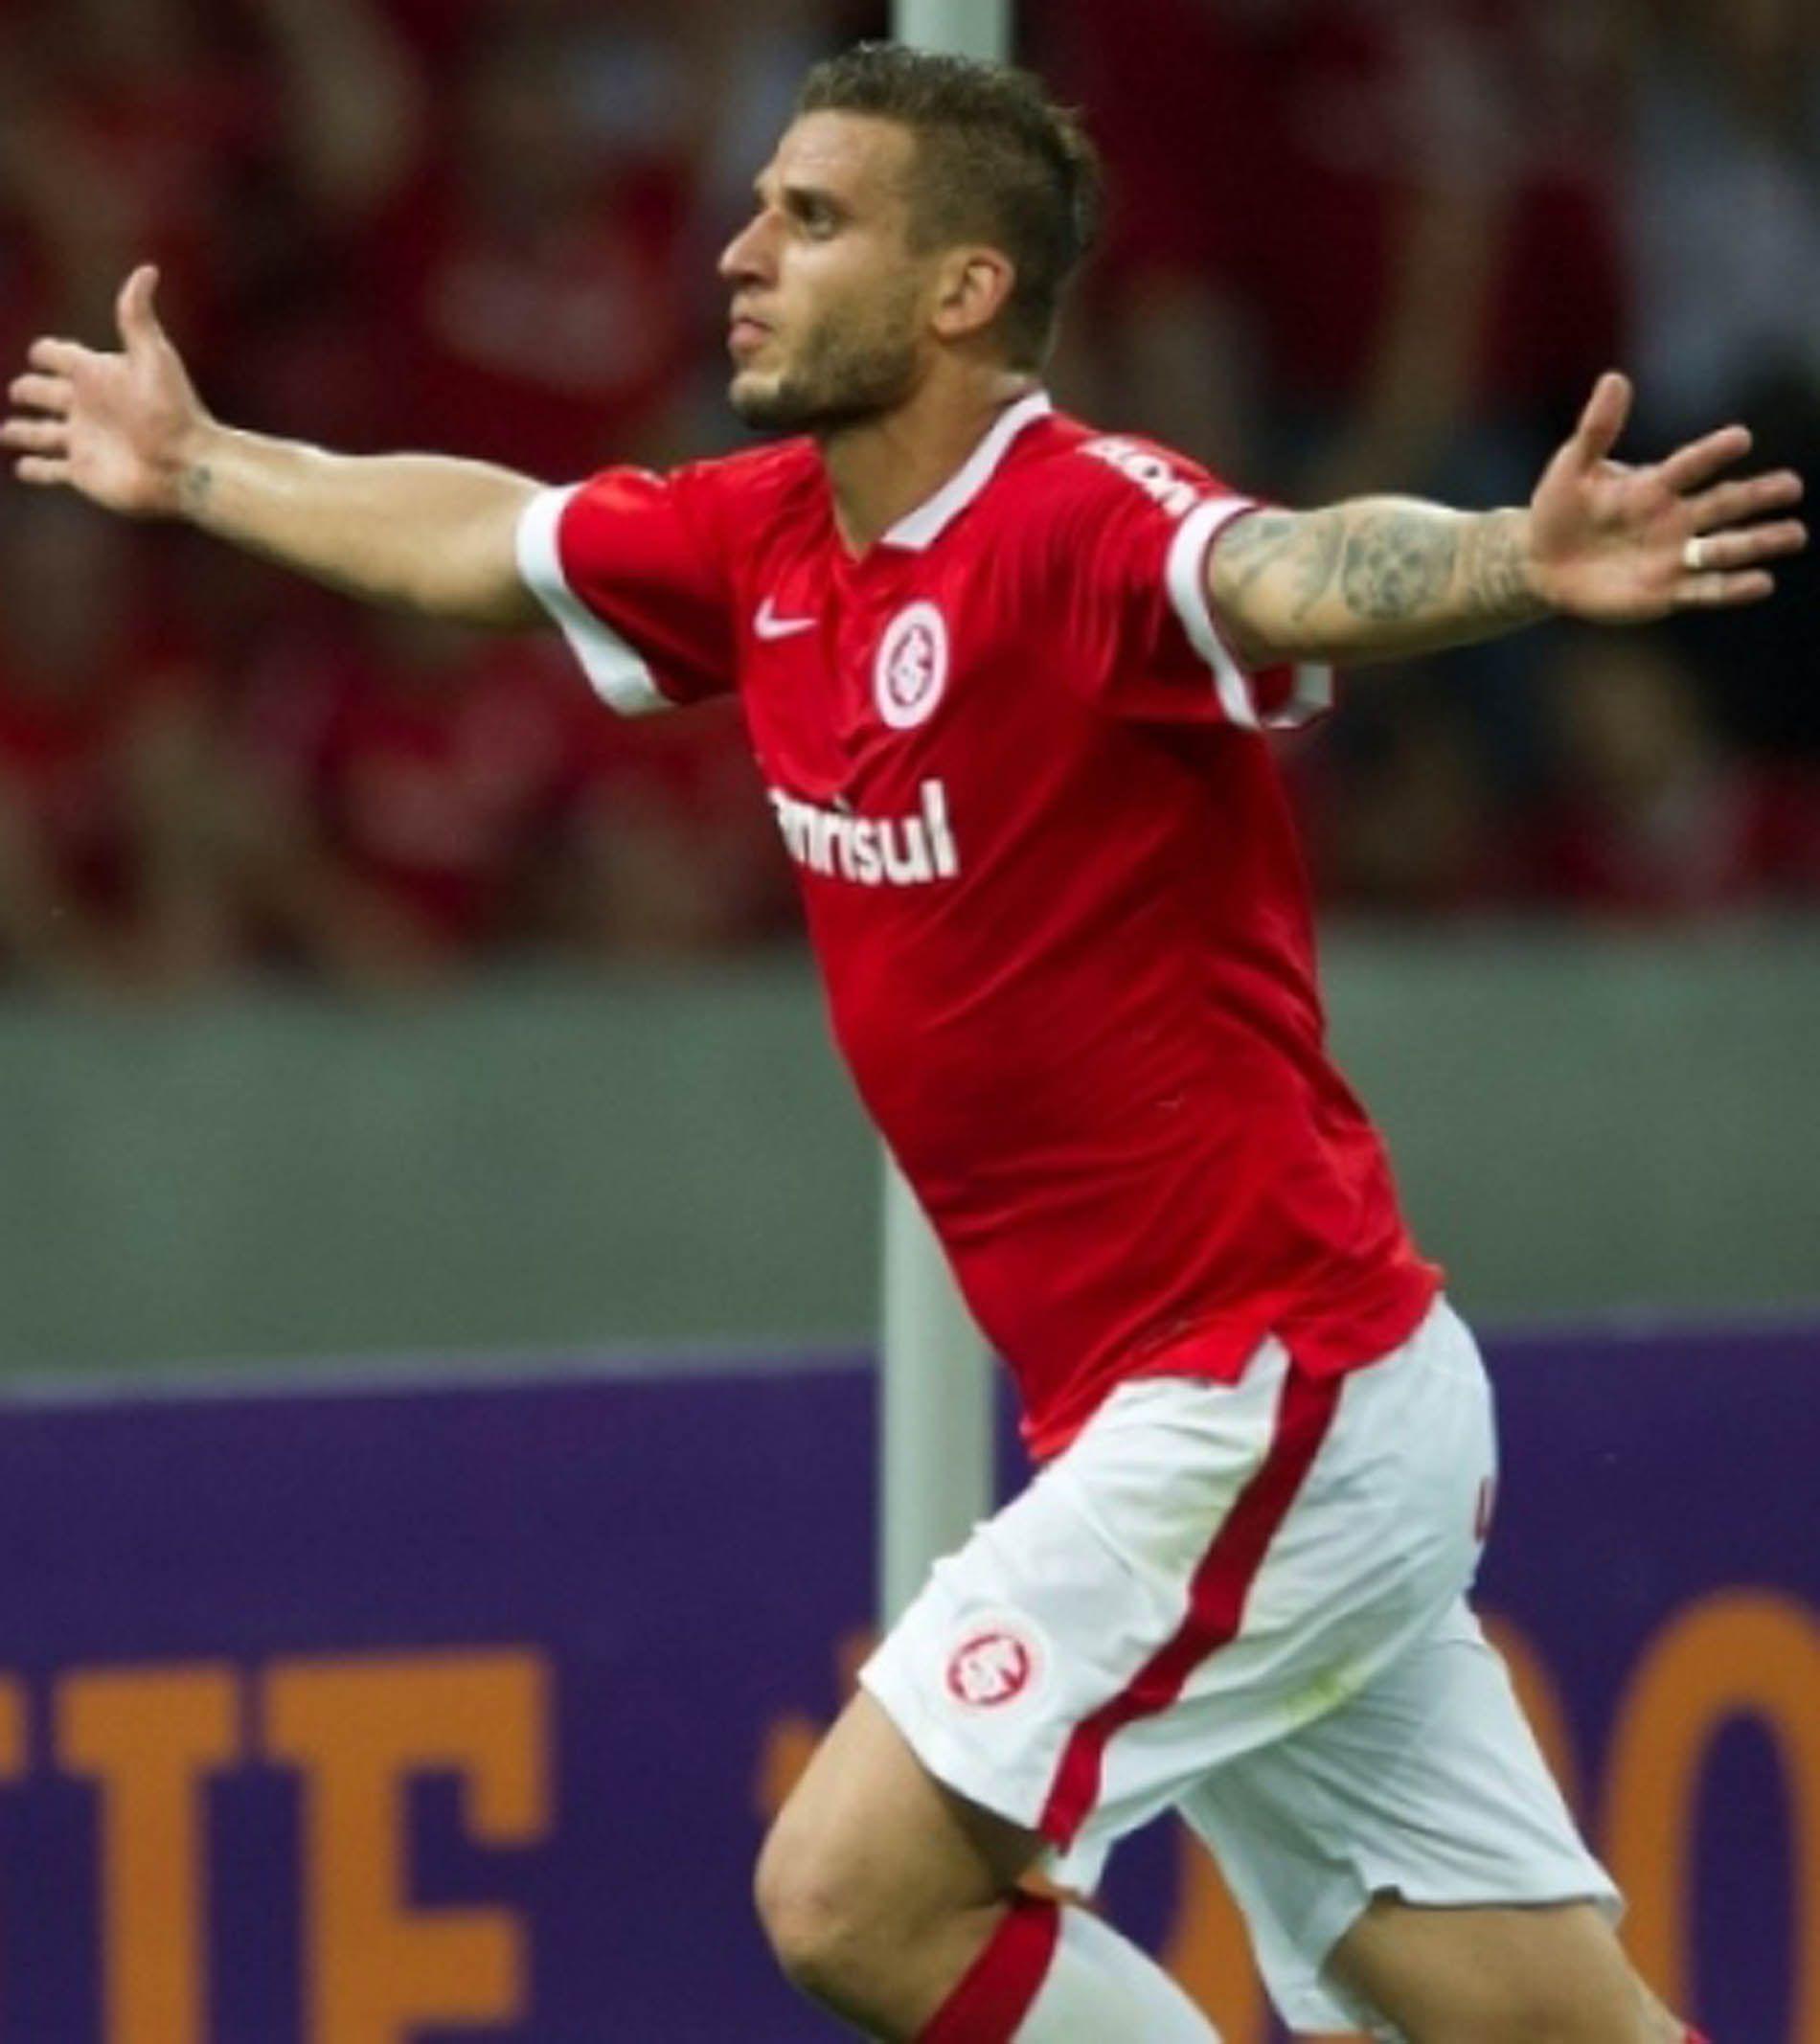 Rafael Moura Segue Na Pauta Do Atlético